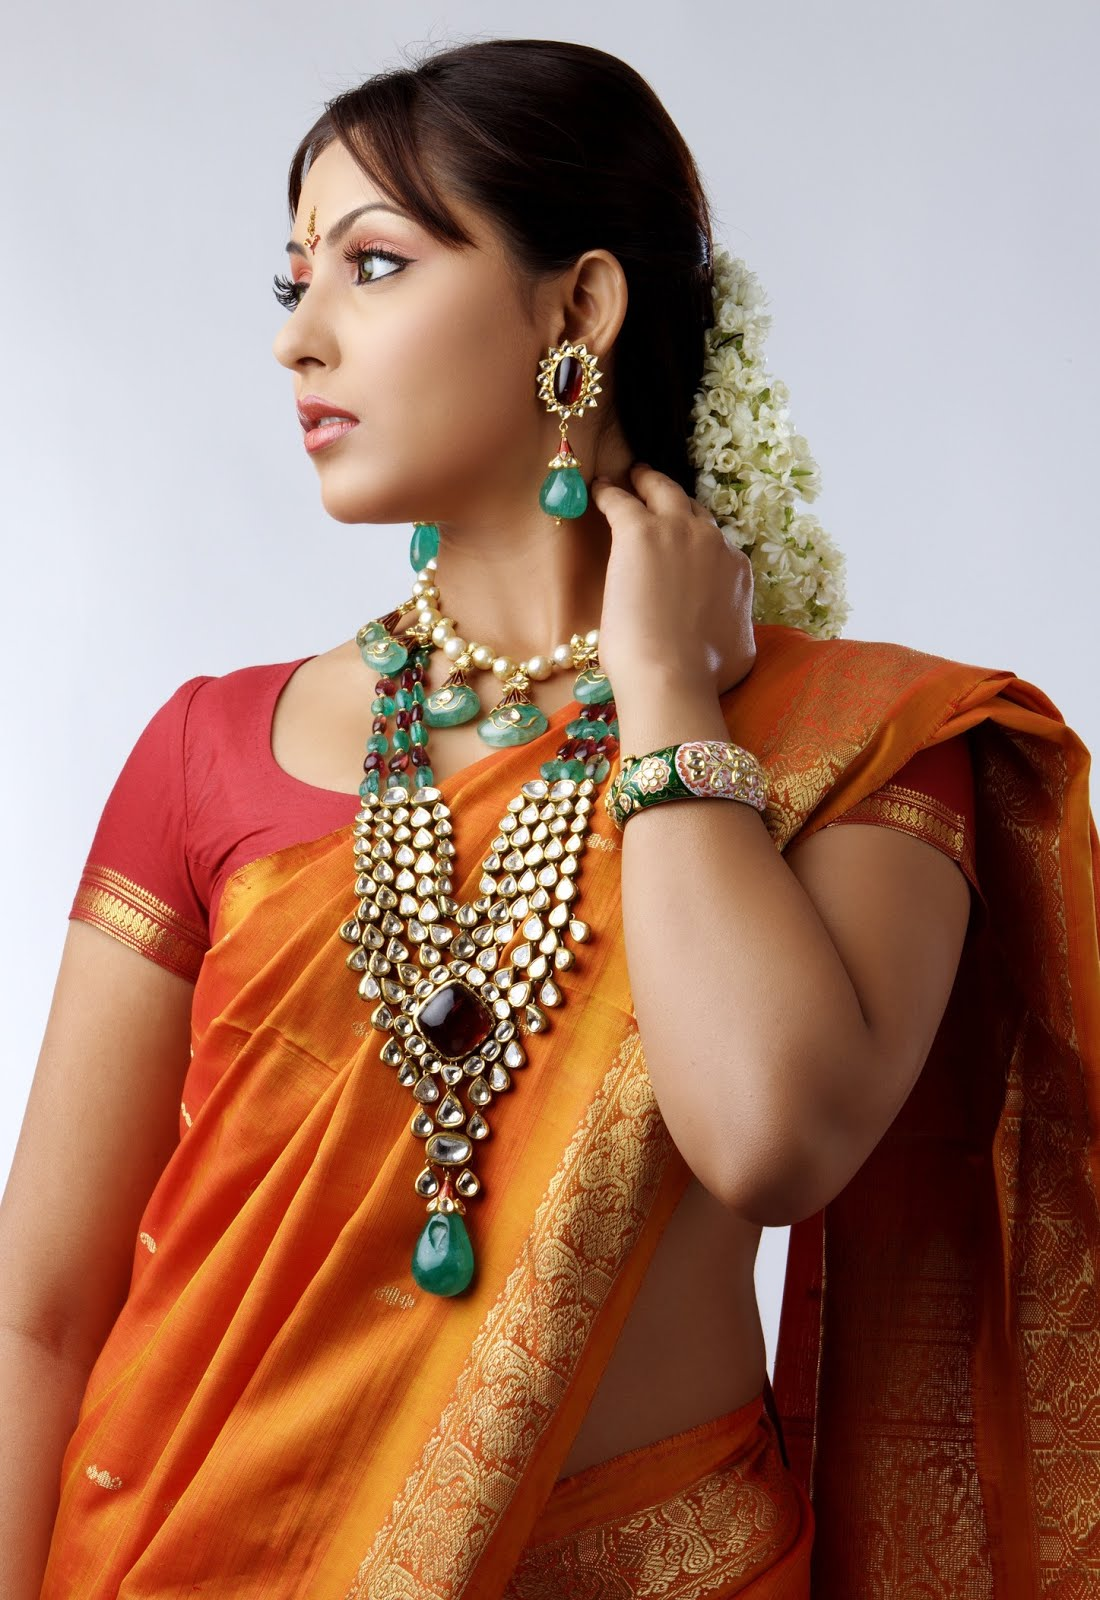 Slicypics Indian Actress Tamanna Bhatia Photos: Madhu Shalini Hot And Spicy Pics